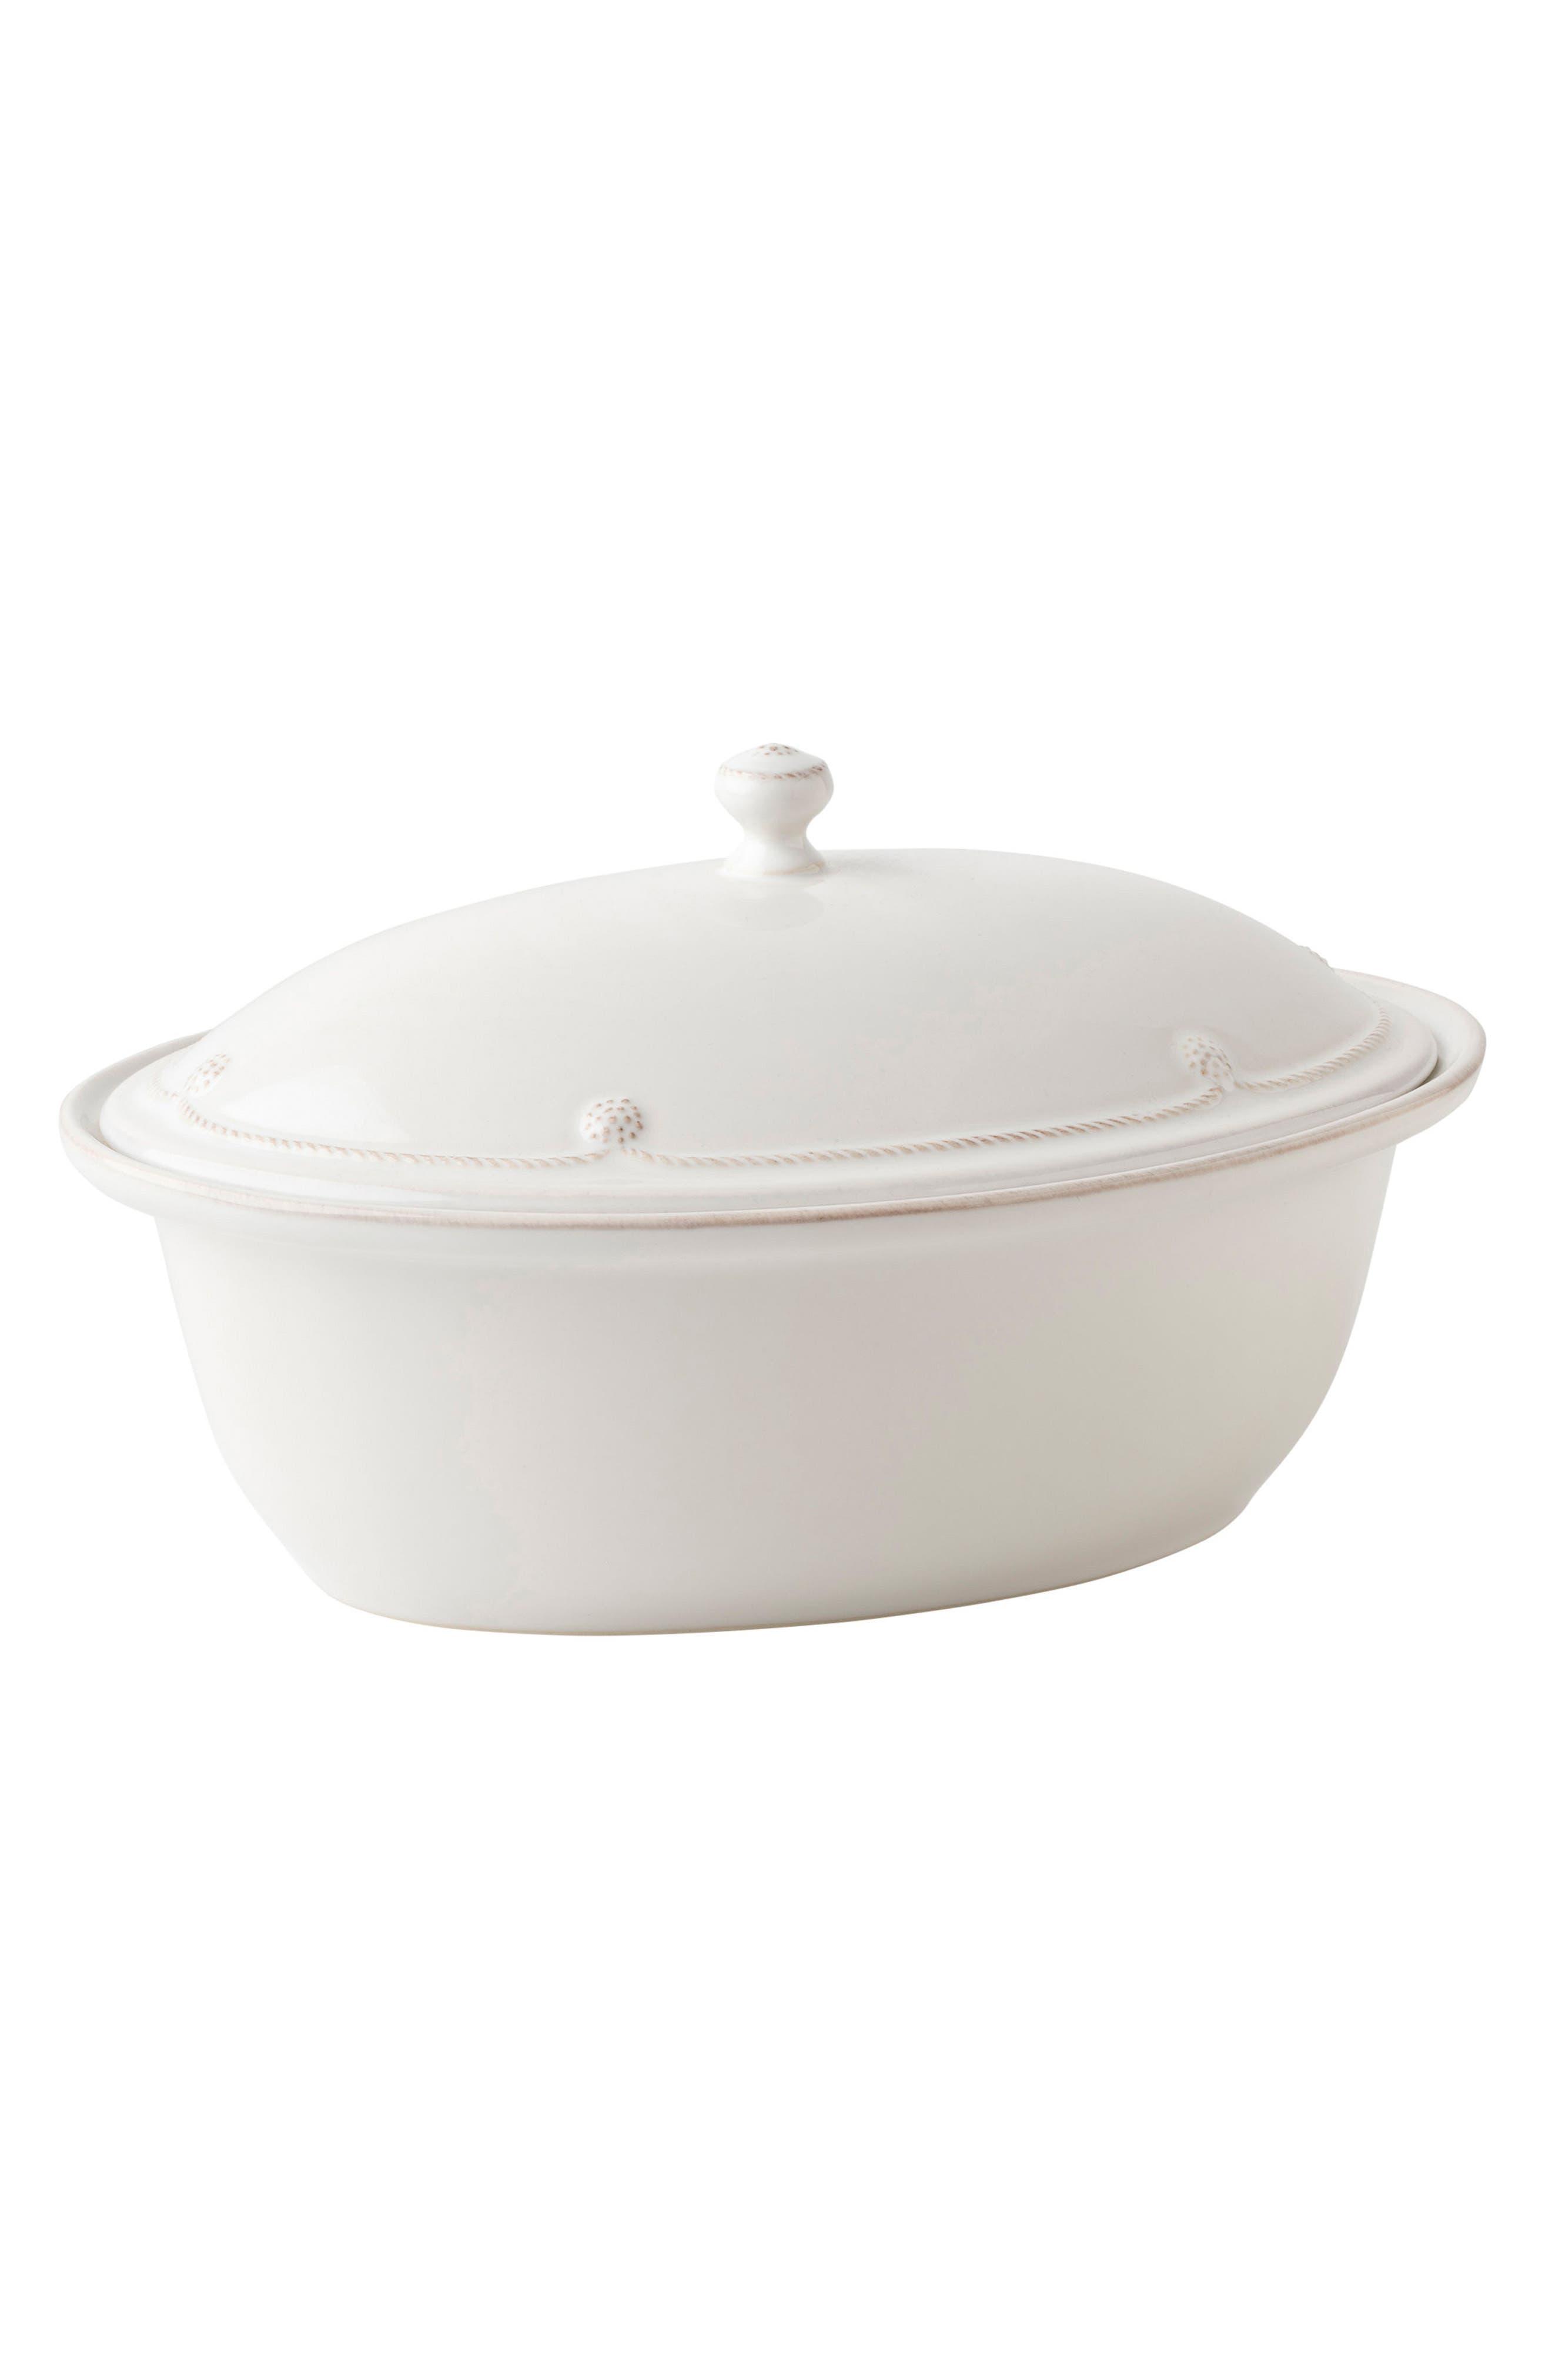 Berry & Thread Whitewash Ceramic Covered Casserole Dish,                             Alternate thumbnail 3, color,                             Whitewash